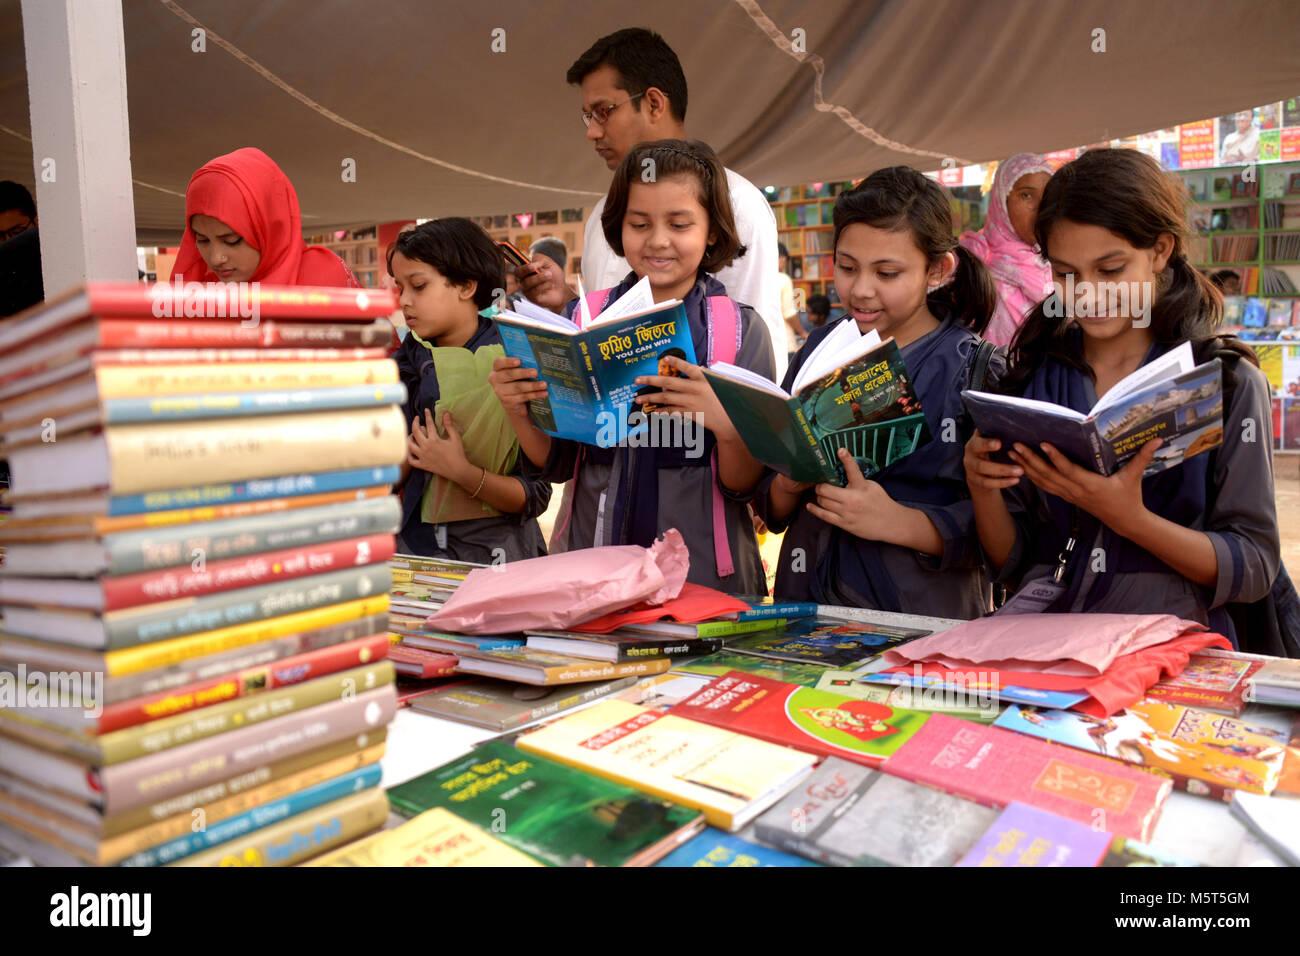 essay book fair bangladesh Shrestha, nanda r nepal and bangladesh: a global studies hand-book santa barbara, calif:  in 1991, the first free and fair election was held in bangladesh.